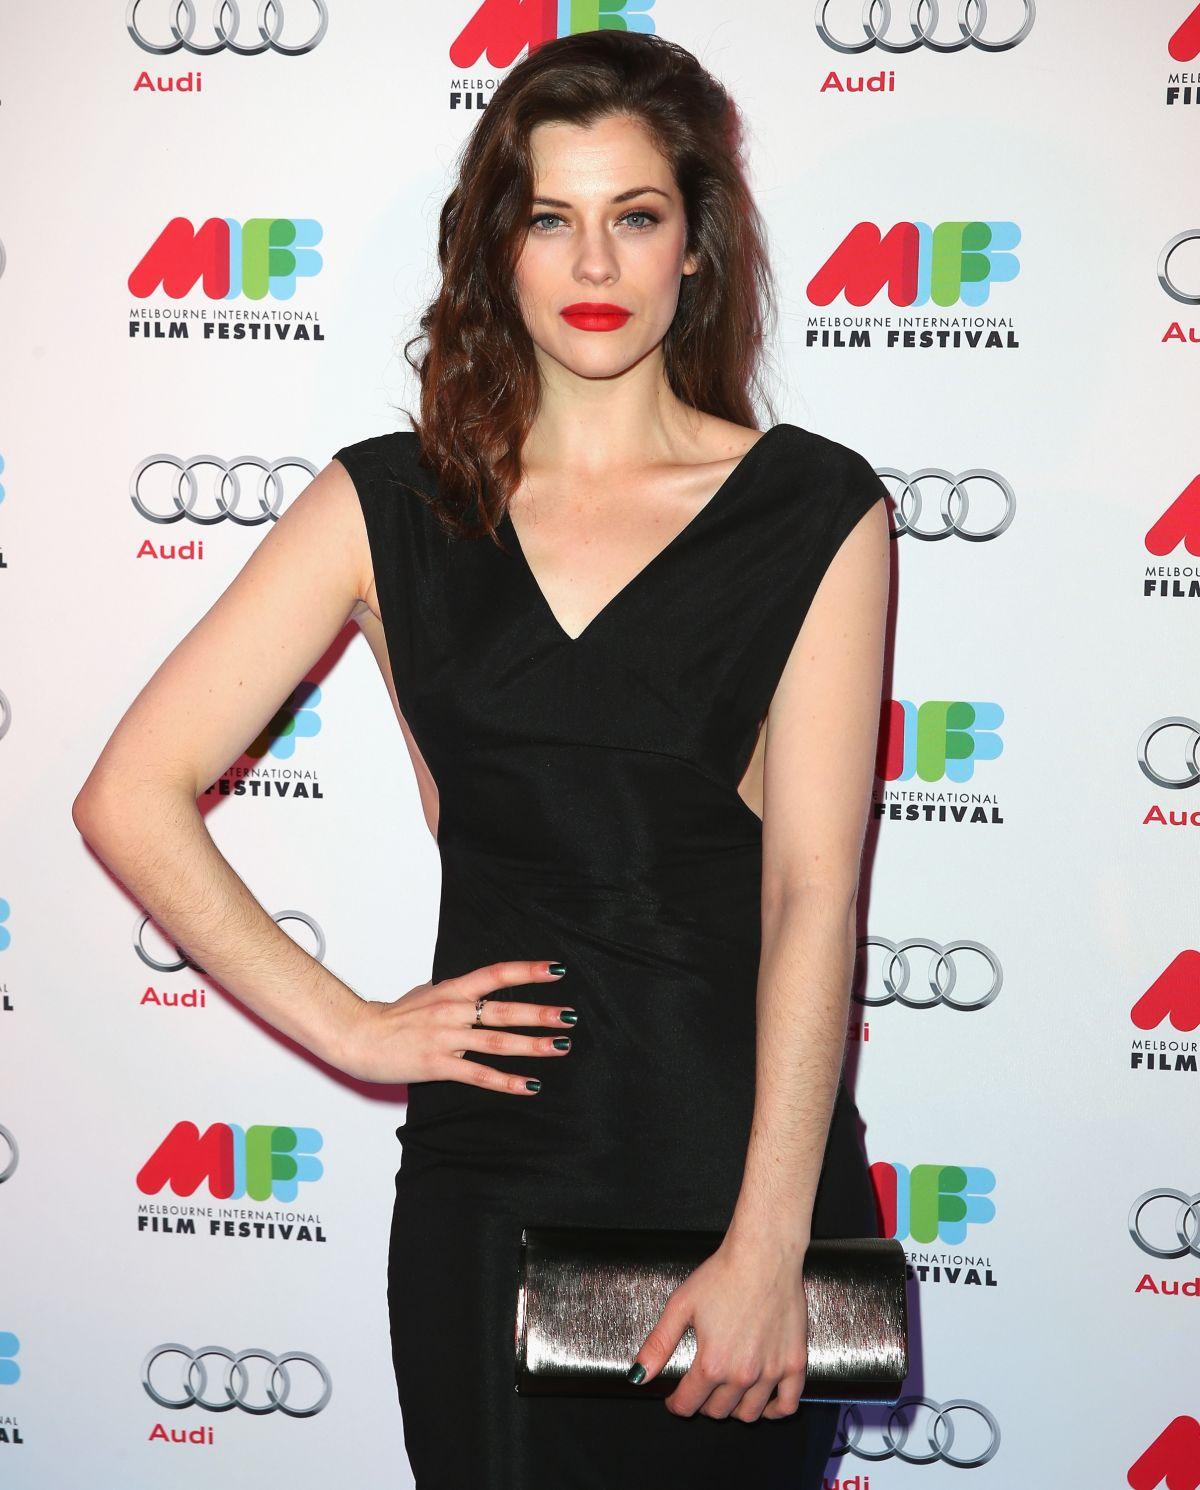 JESSICA DE GOUW at Melbourne International Film Festival Opening Ceremony